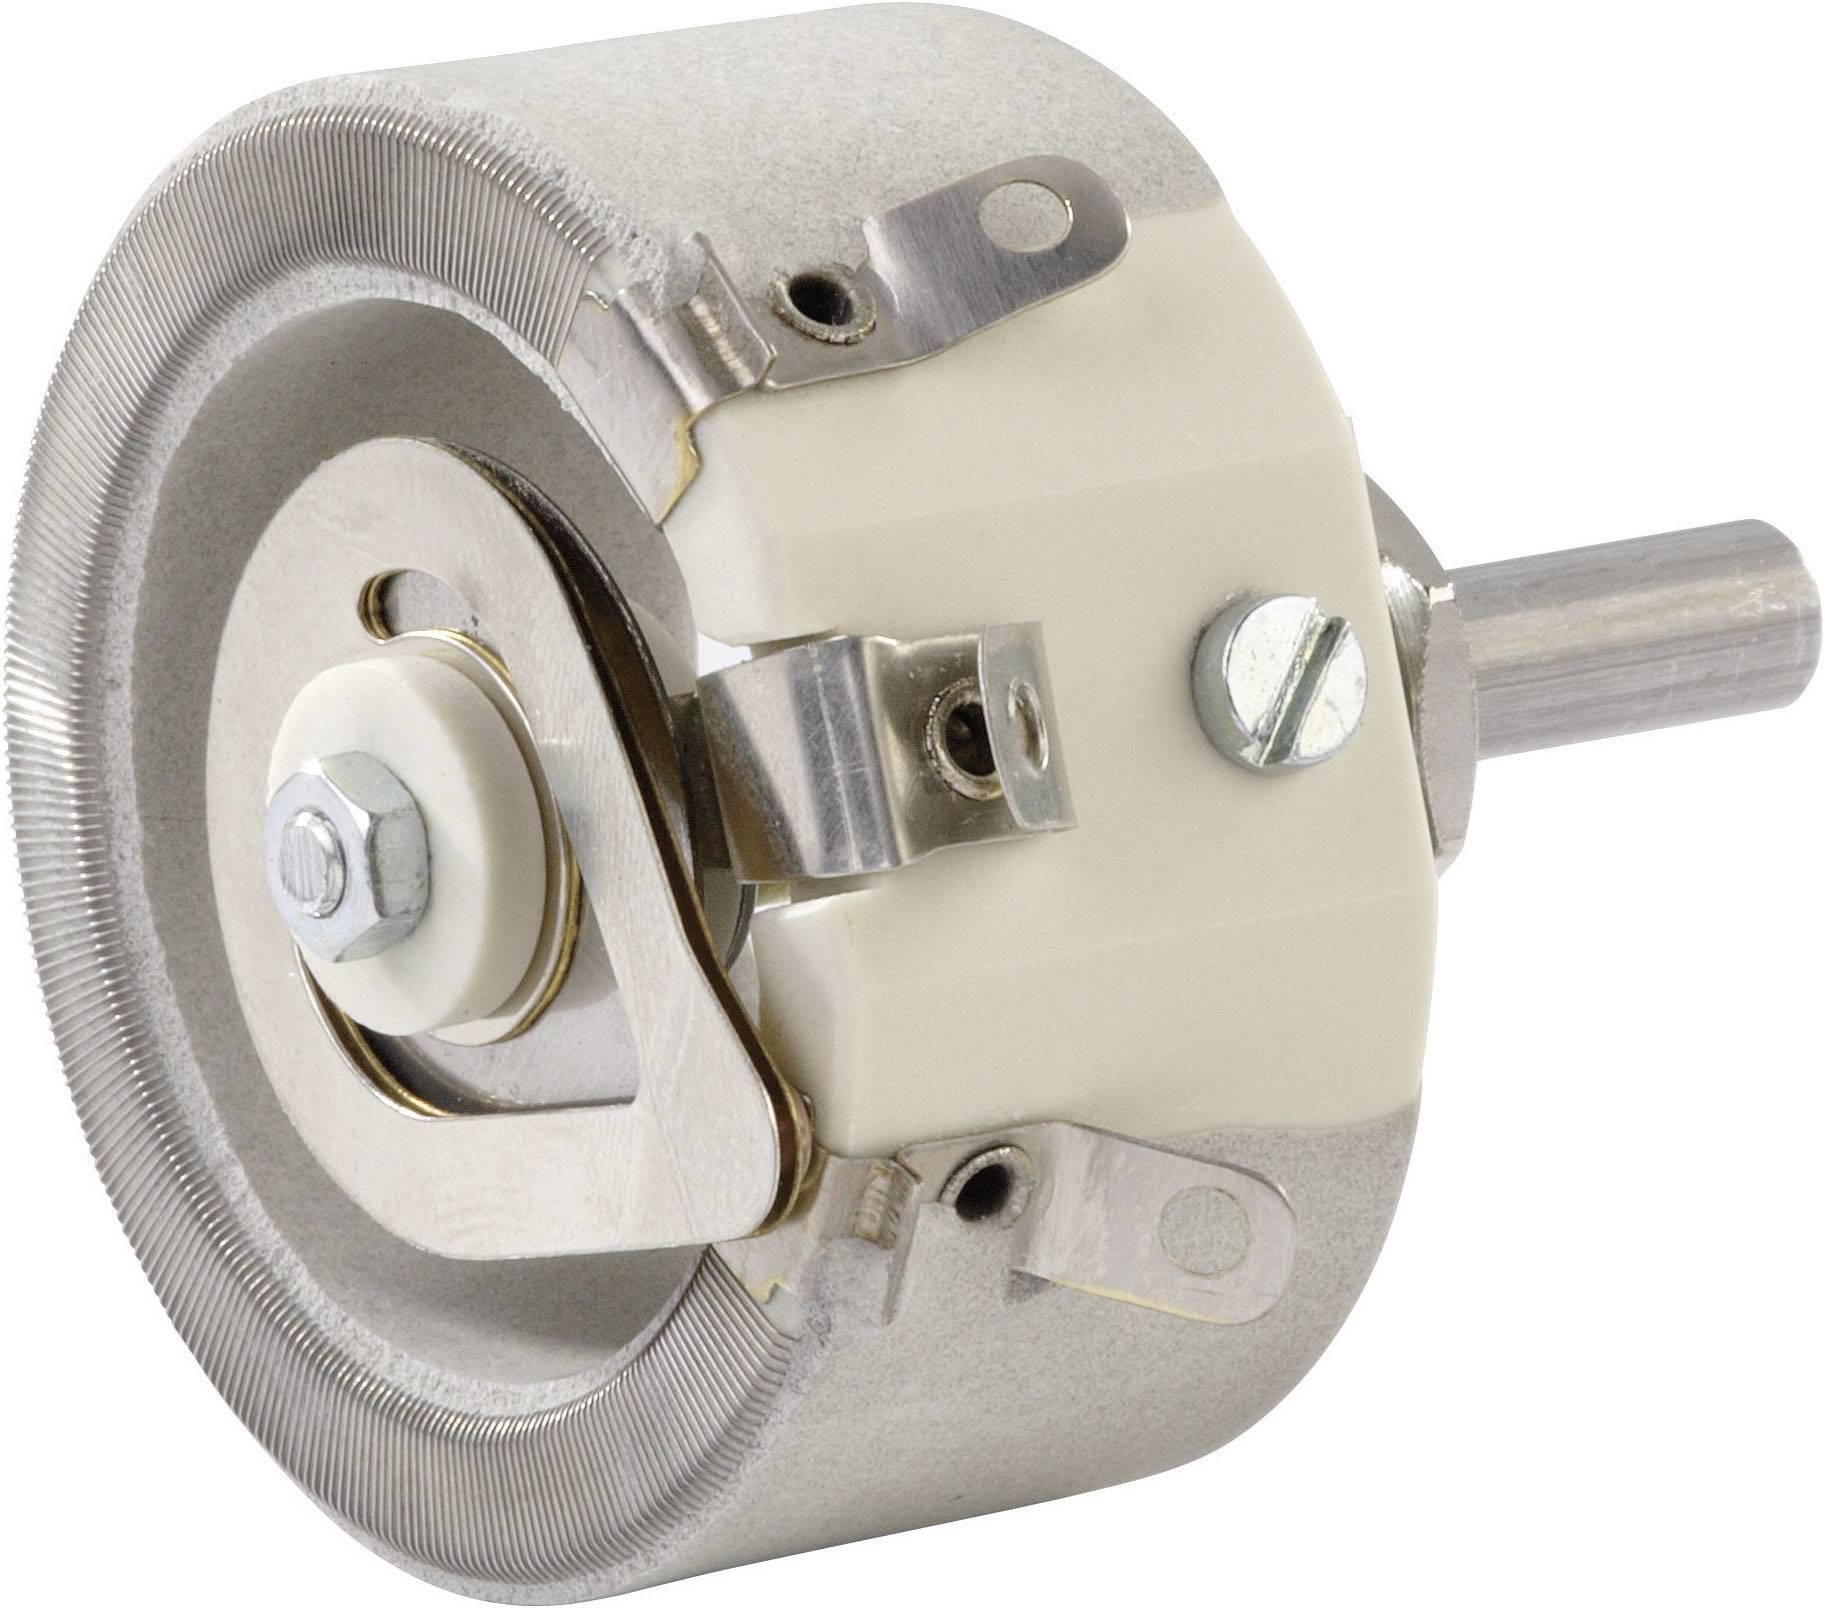 Drôtový potenciometer mono TT Electronics AB 3191106825 3191106825, 30 W, 1 kOhm, 1 ks